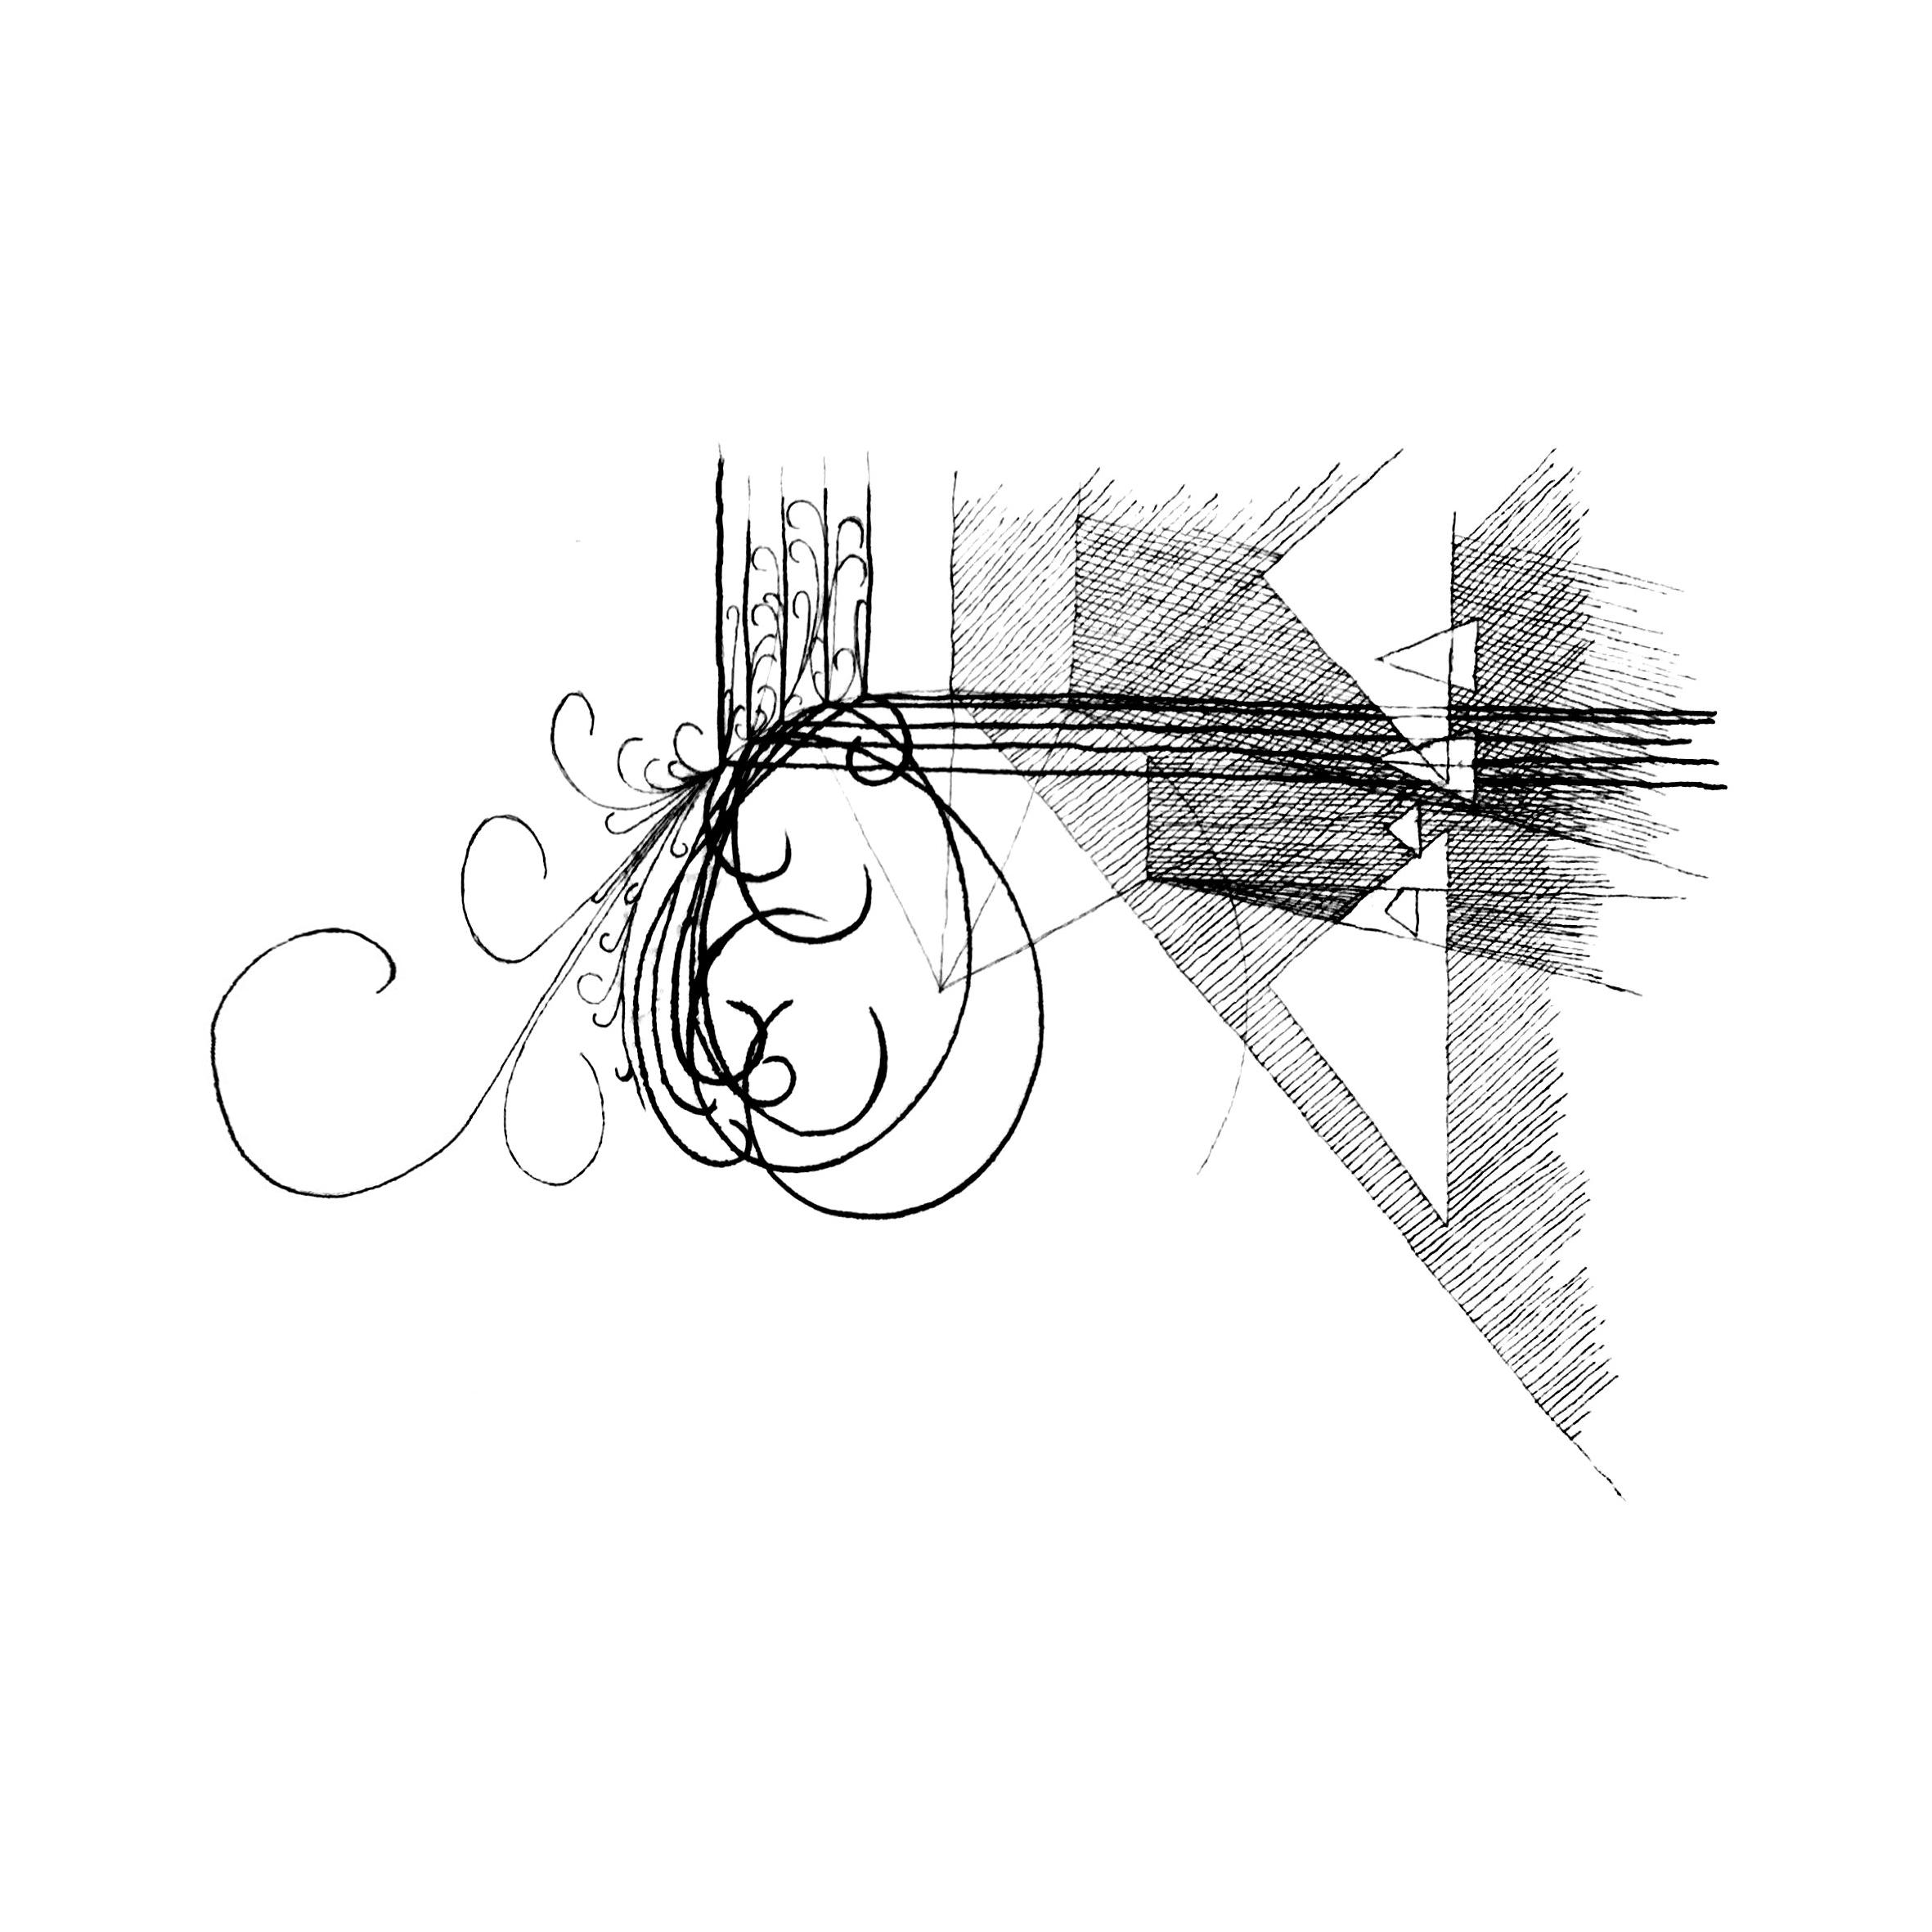 190317_+-ratio_illu_1